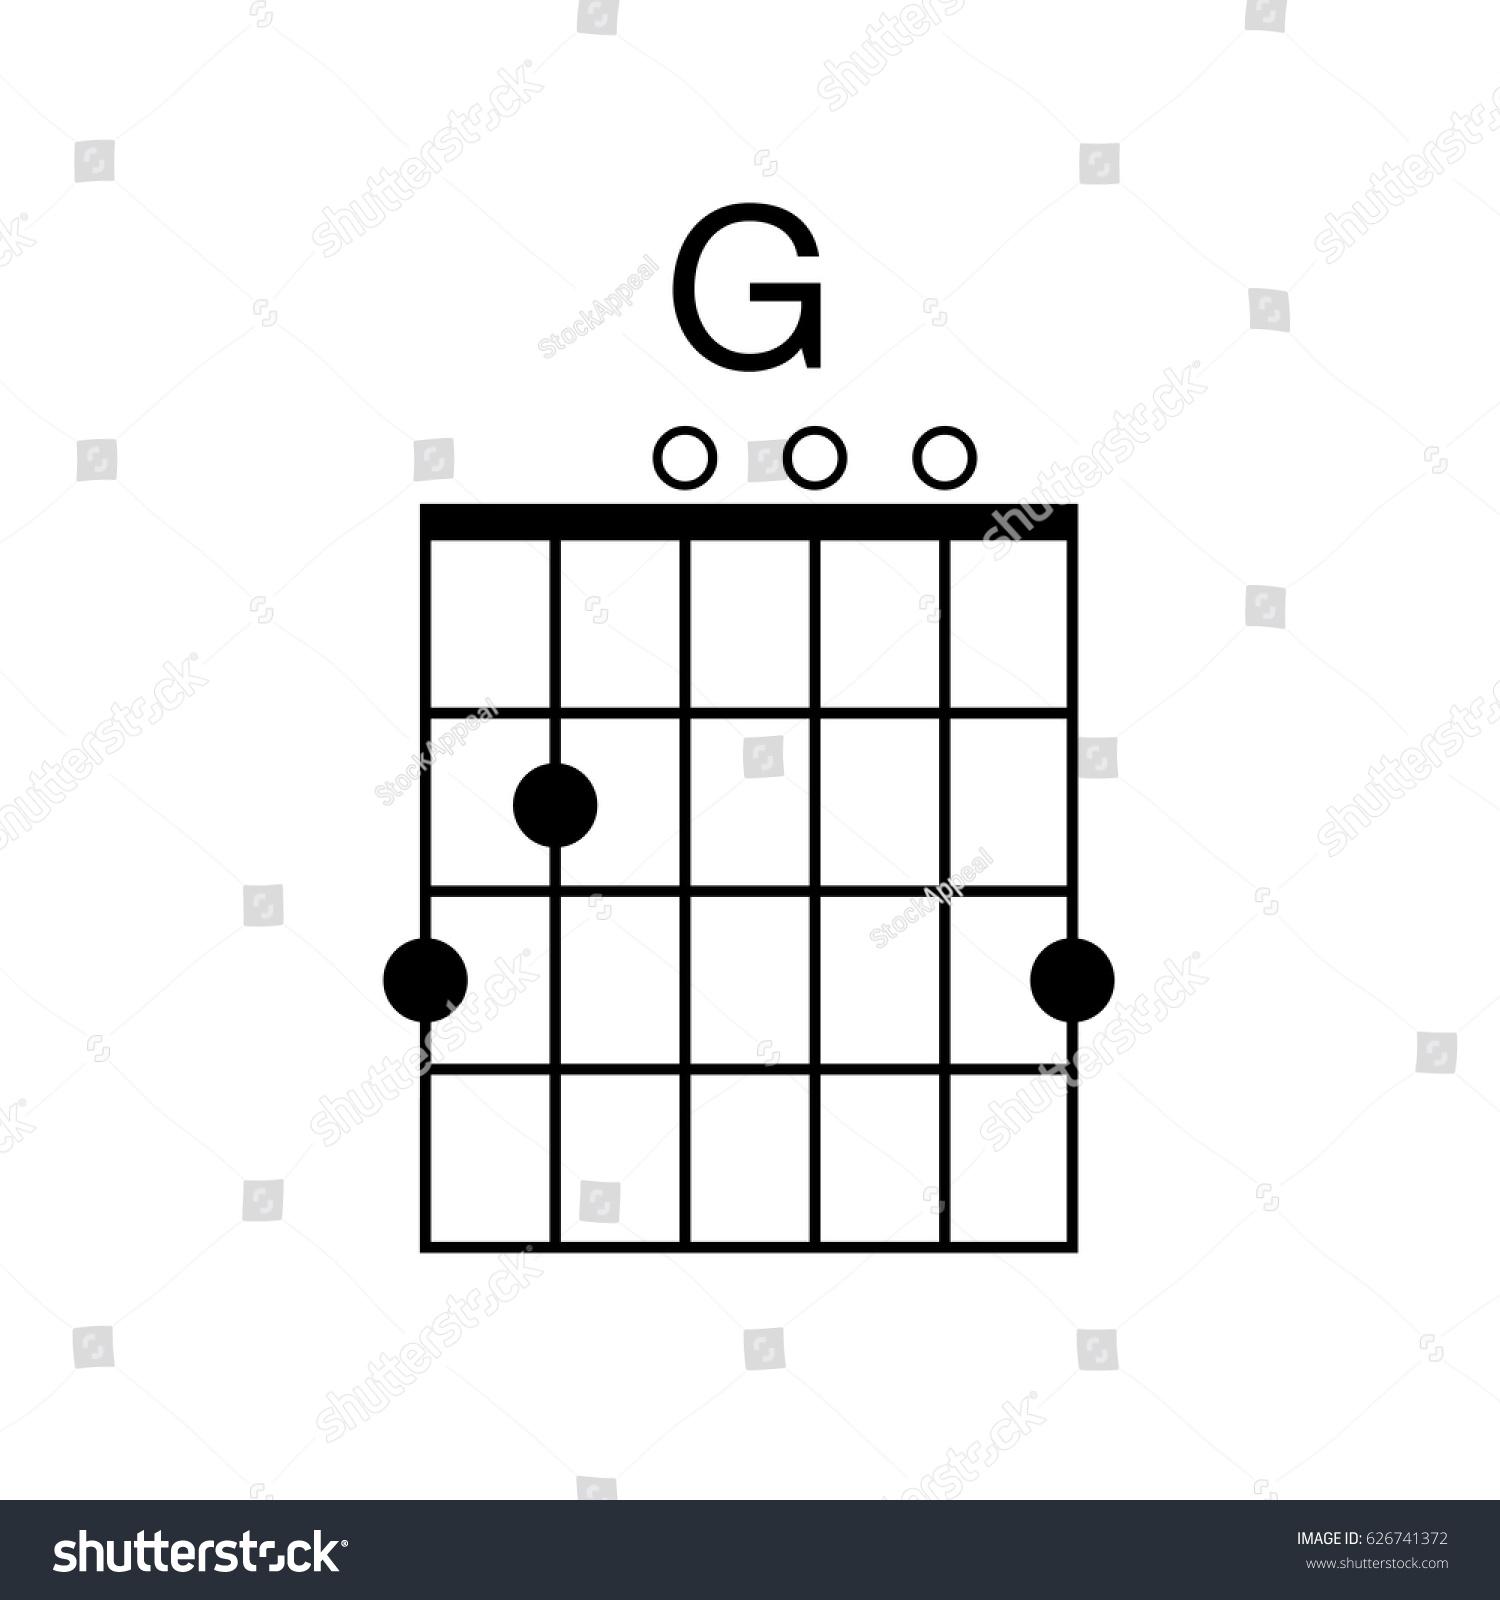 Vector Guitar Chord G Chord Diagram Stock Vector Royalty Free